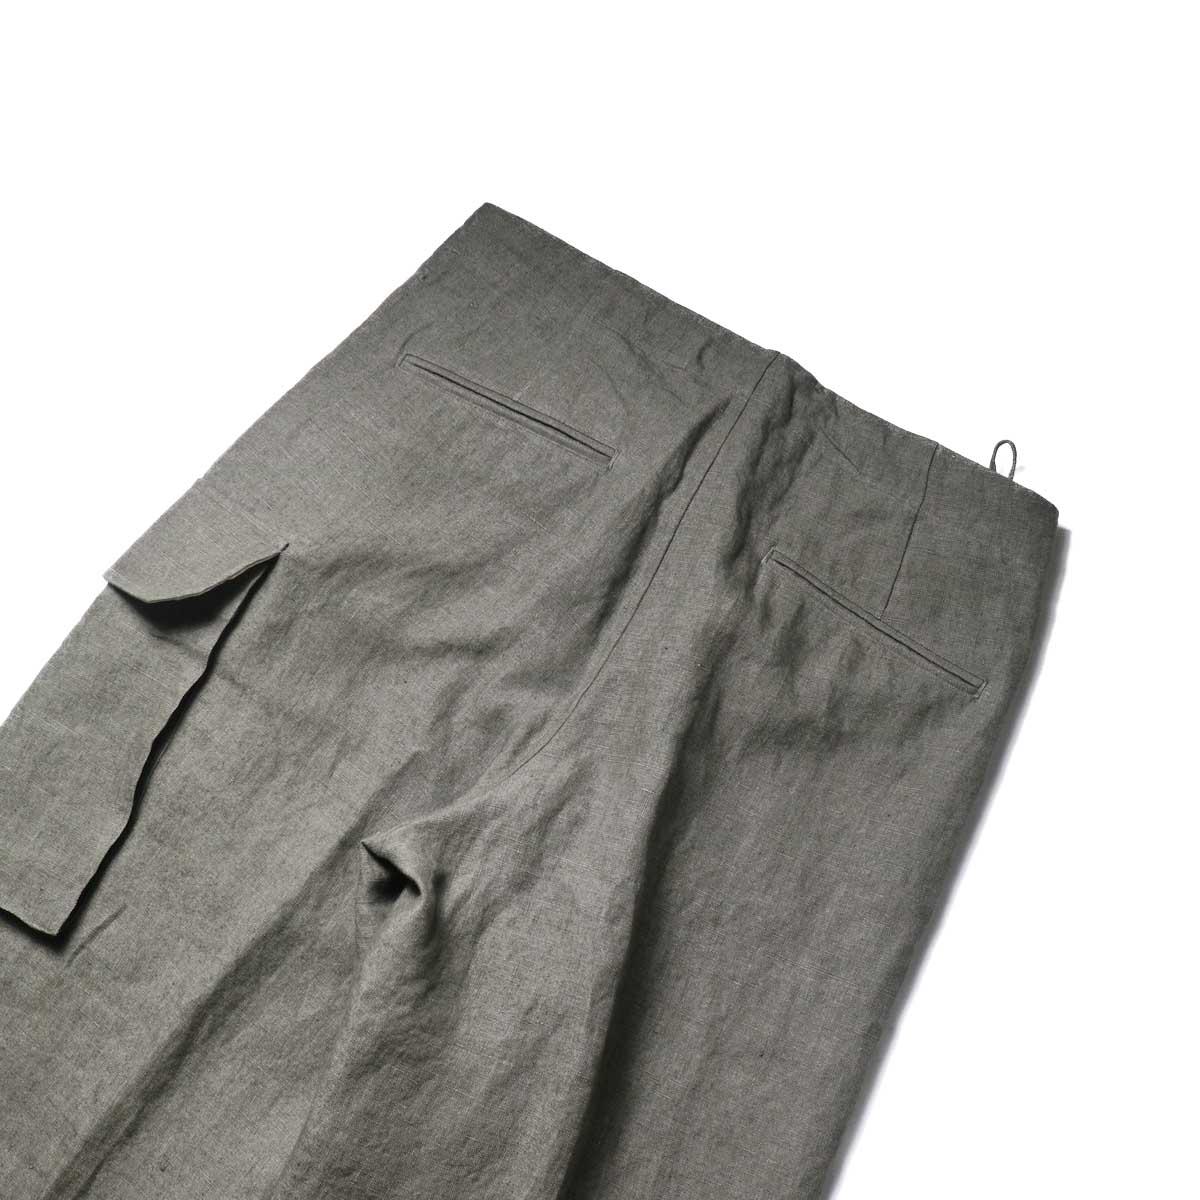 Blurhms / Wash Linen 5P Easy Pants (KhakiGrey)ヒップポケット